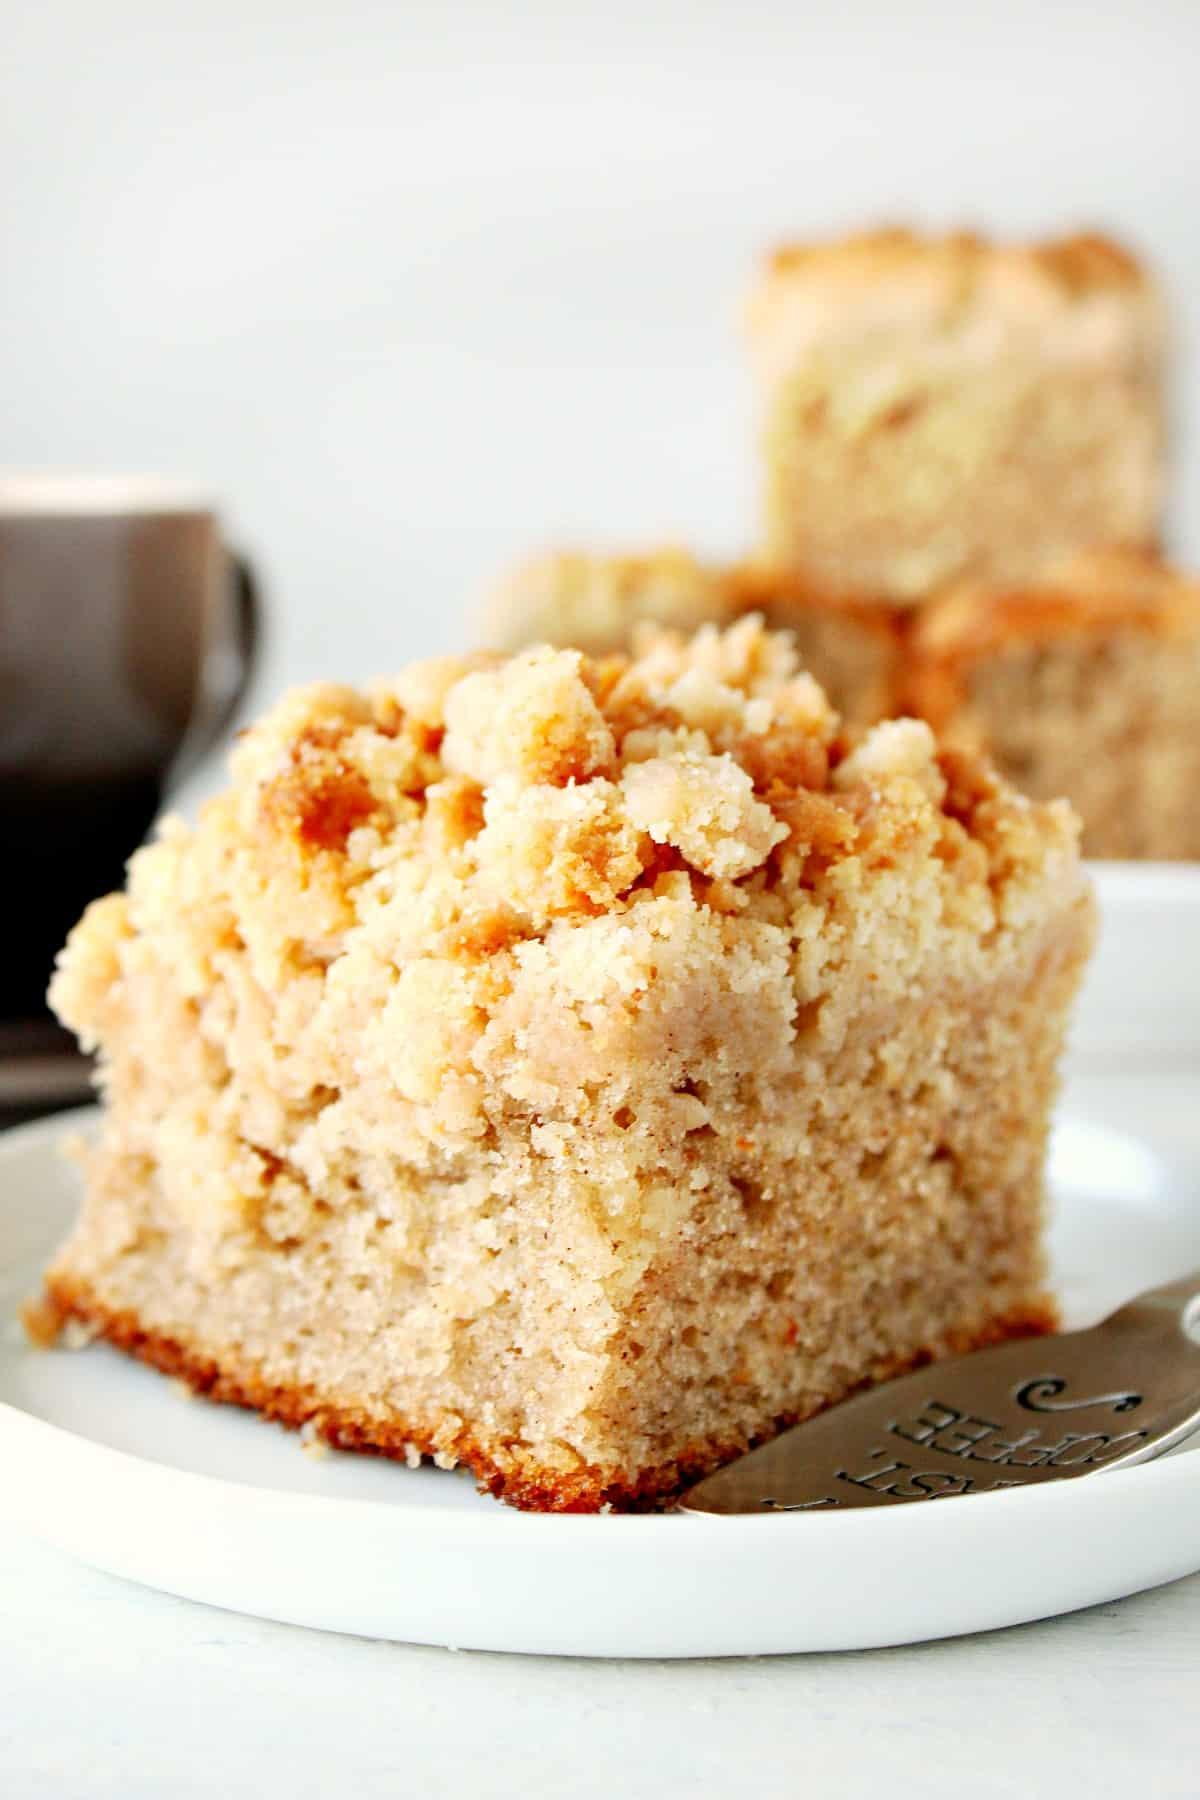 Bolo de migalha fácil Um bolo de migalha fácil